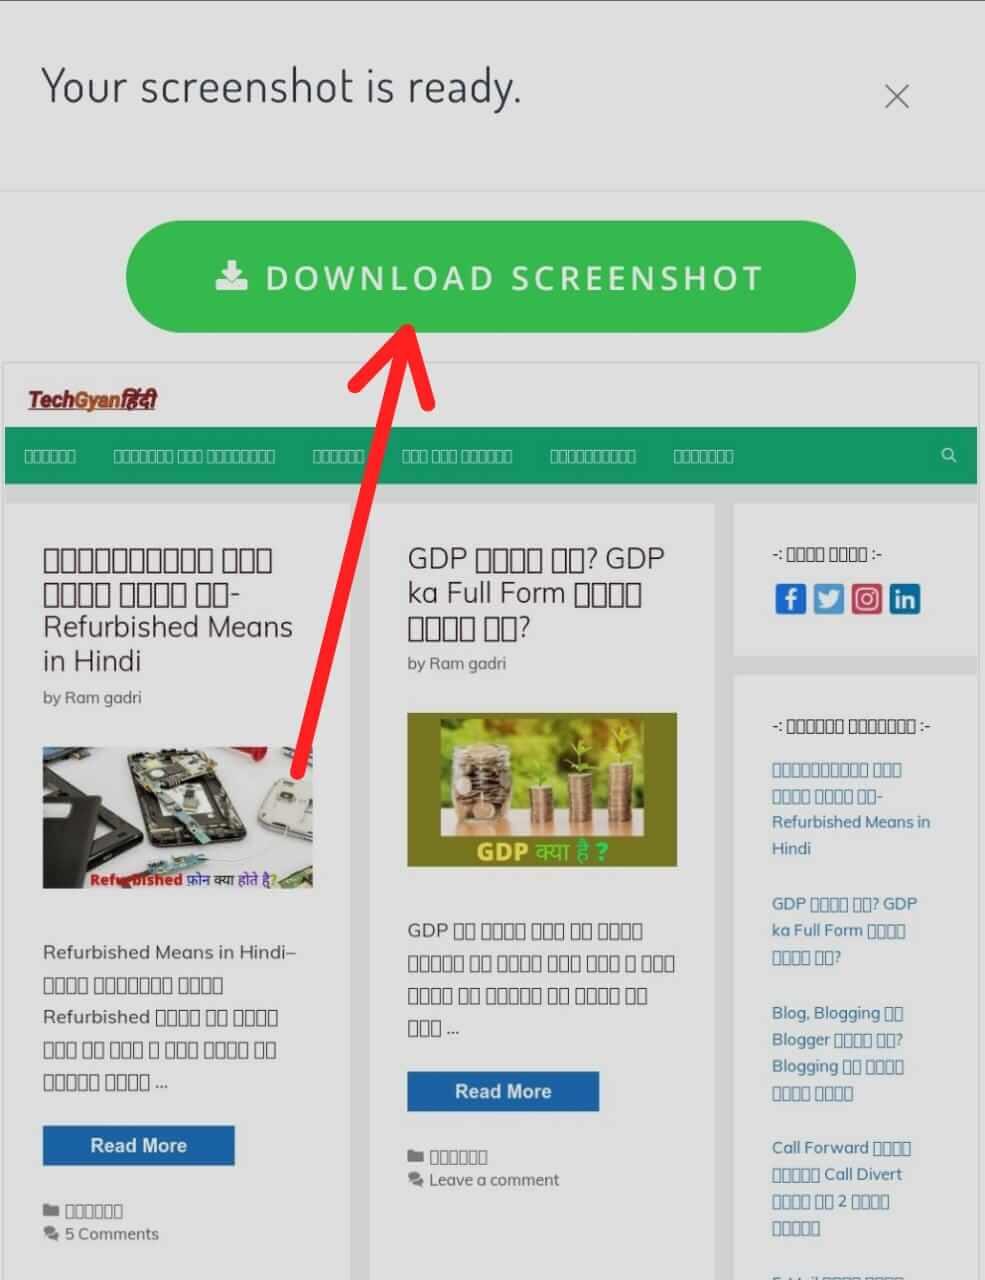 Jio Phone में Screenshot कैसे लें Jio Phone में Screenshot लेने का तरीका Jio Phone में Screenshot कैसे मारे Online Screenshot लेने वाली वेबसाइट क्या Online Screenshot लेना बिलकुल फ्री हैं